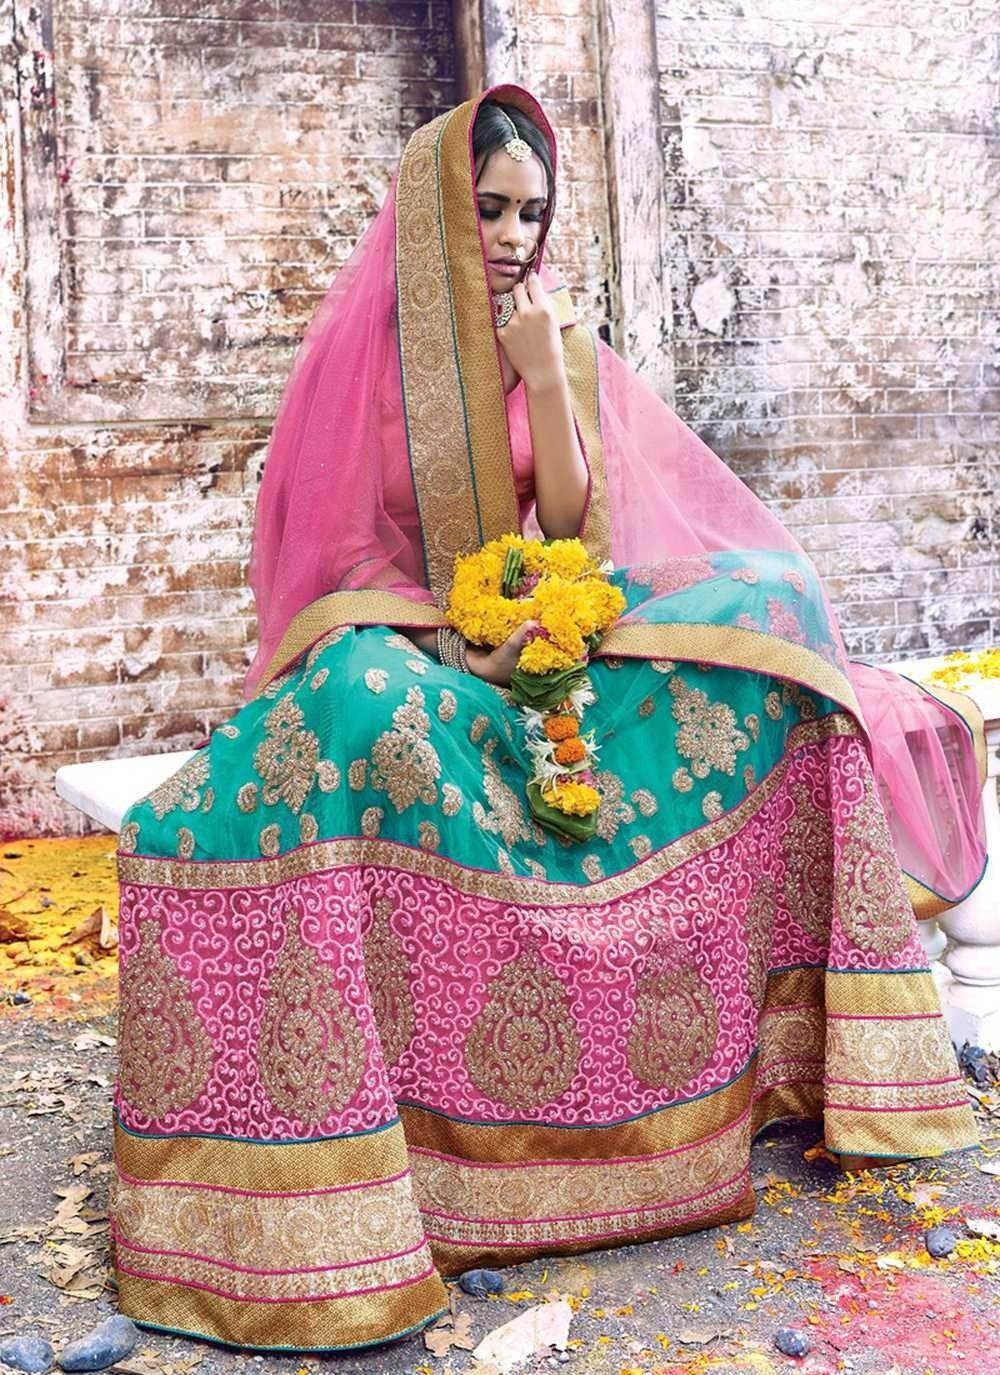 Turquoise Lehenga Choli for Ring Ceremony, Net Lehenga Choli for ...